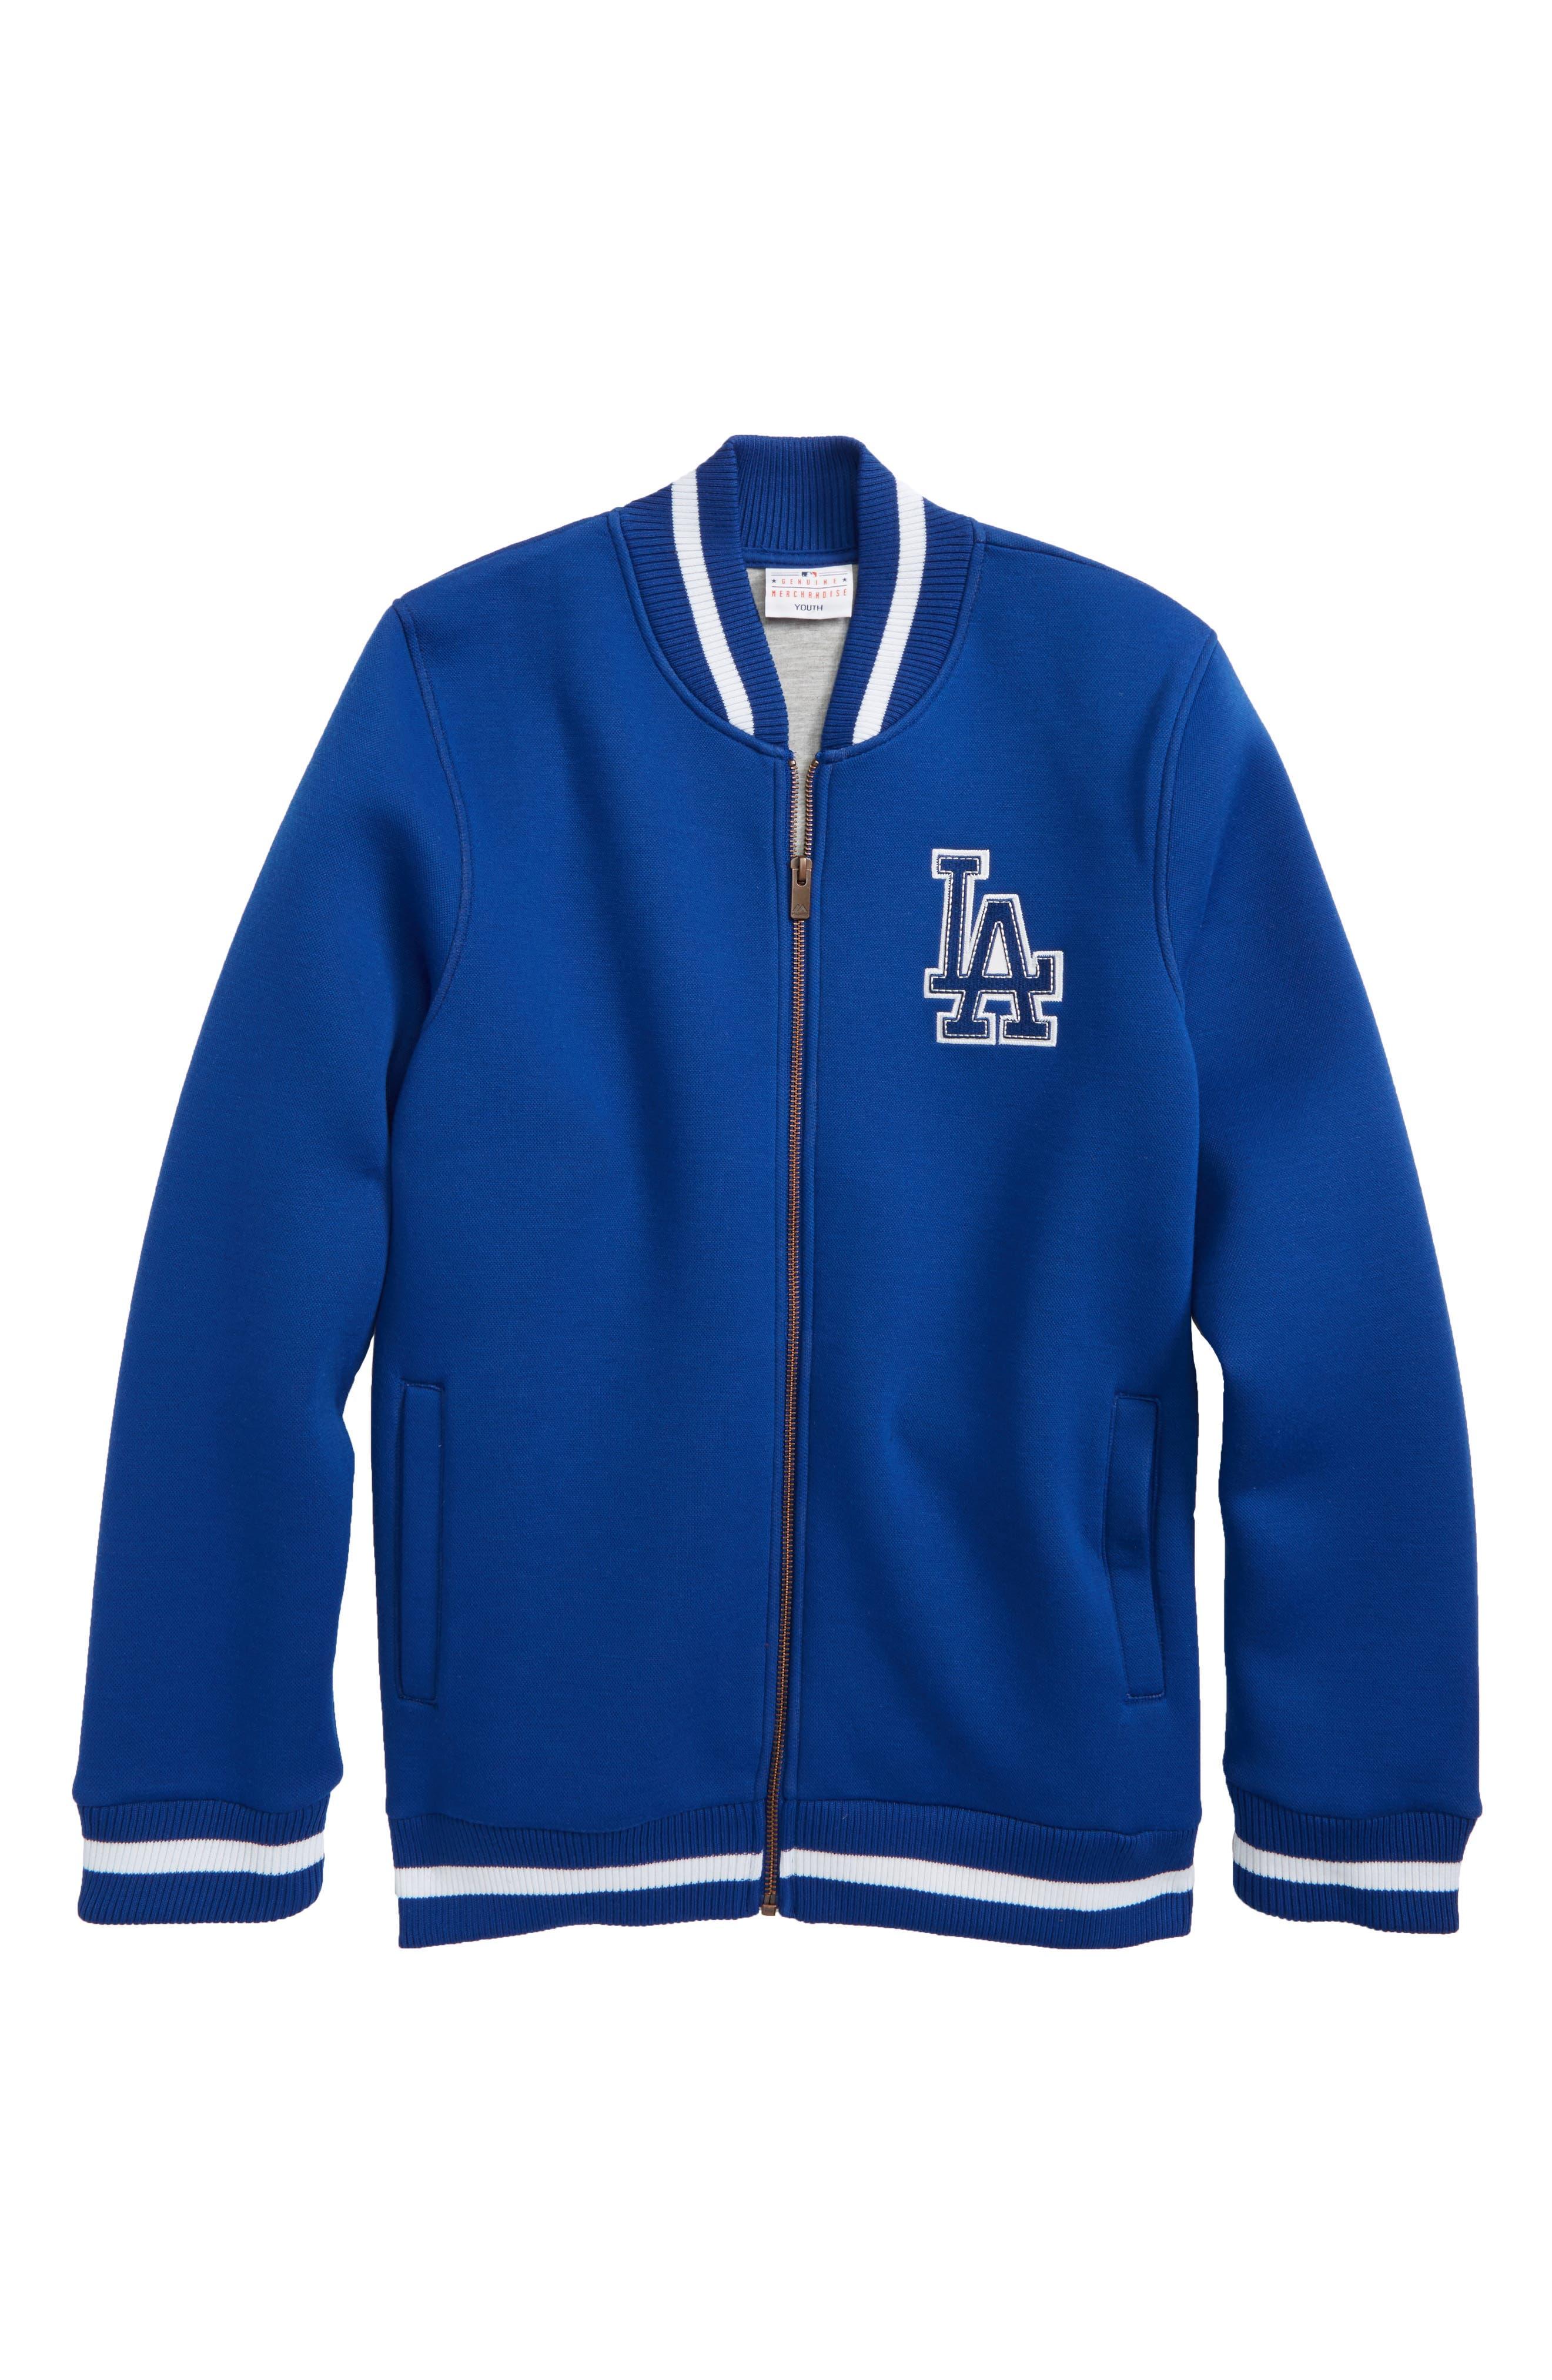 Classical Los Angeles Dodgers Knit Varsity Jacket,                         Main,                         color, 400